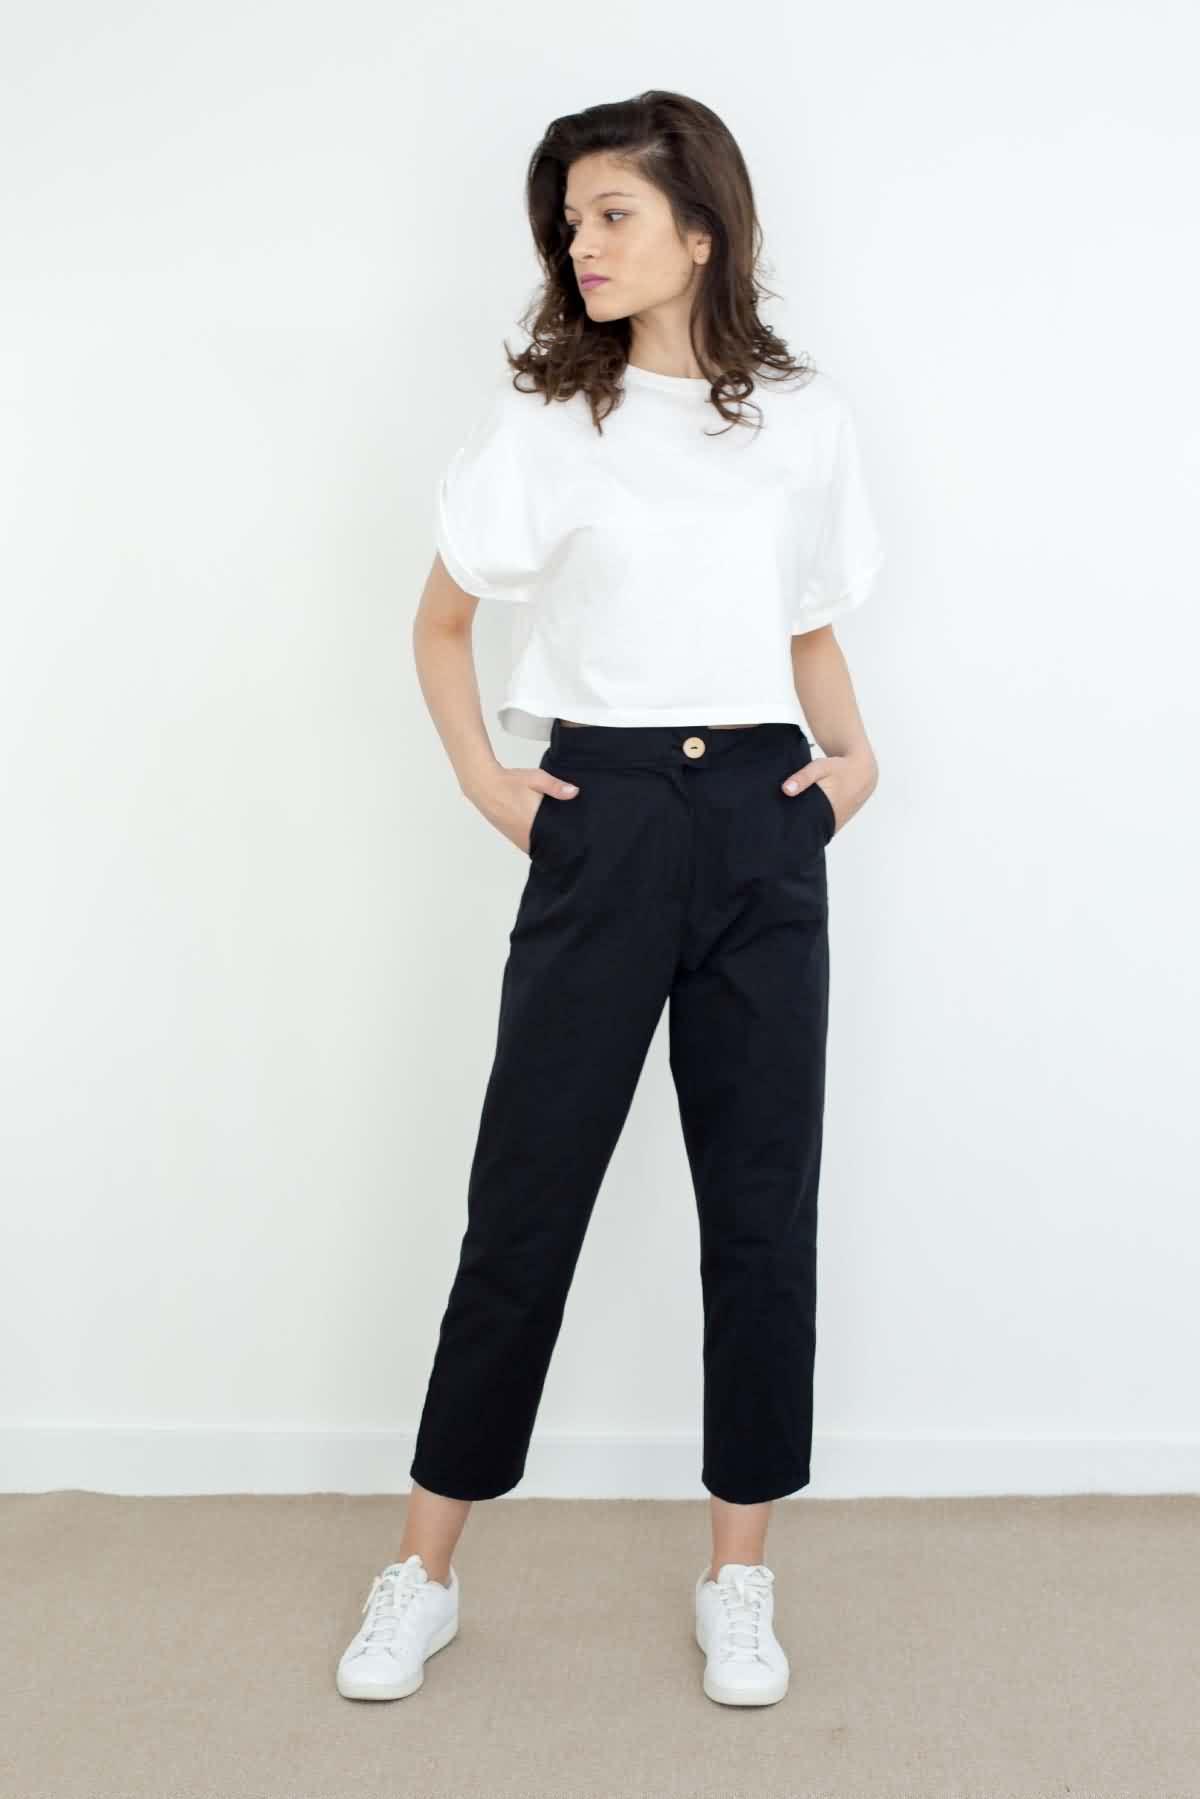 Mevra - Yüksek Bel Pantolon Siyah